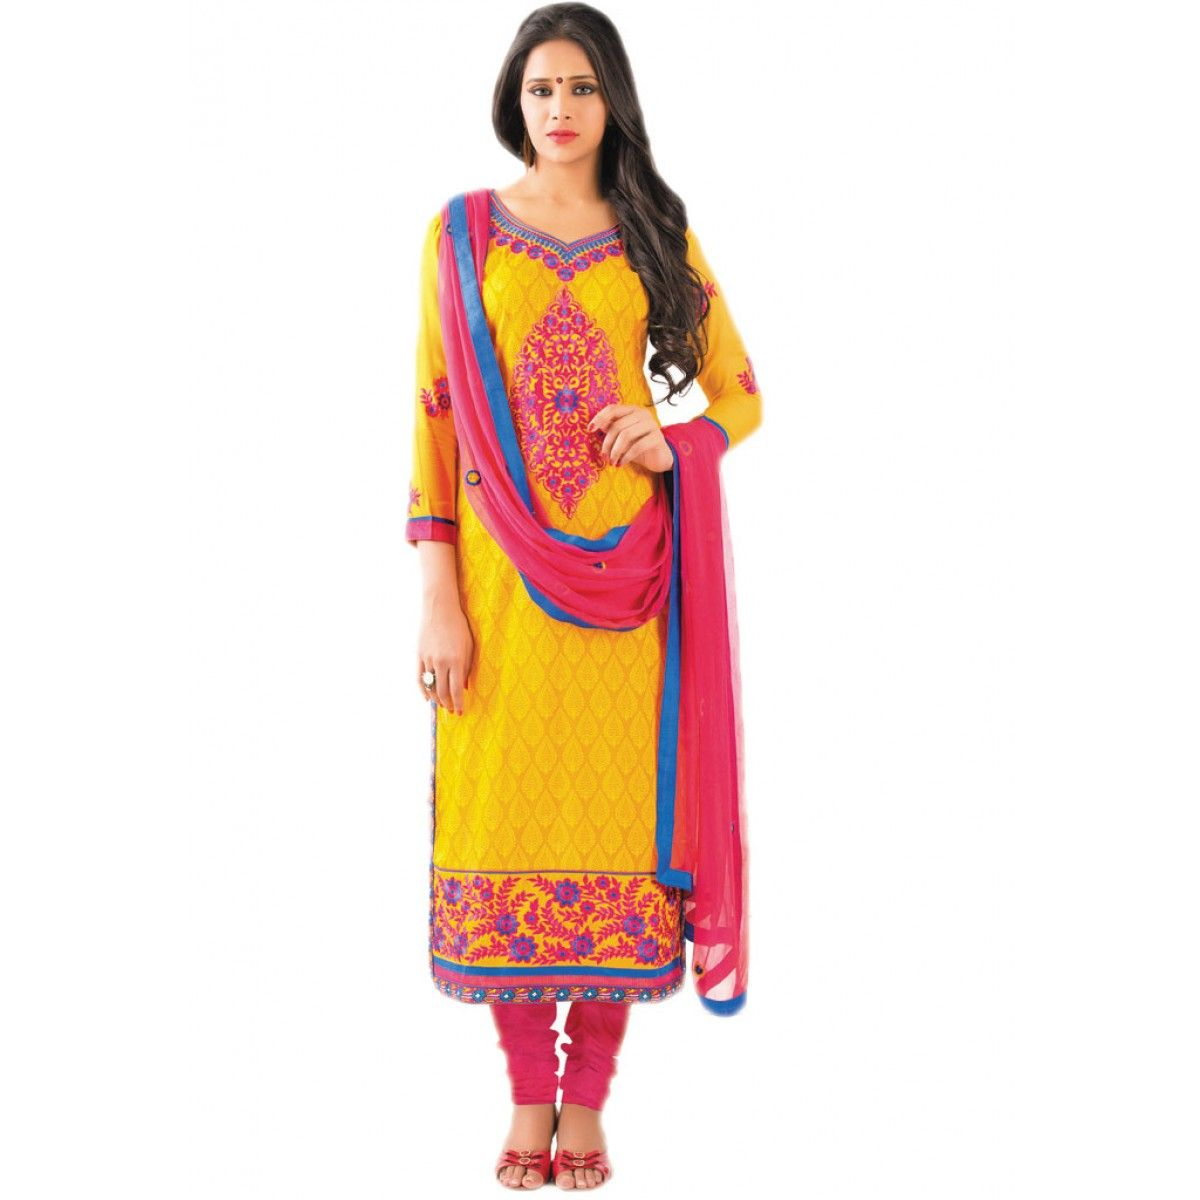 Stylish Yellow Cotton Party Wear #ChuridarKameez #SalwarKameez #AnarkaliSuit #Dress #Clothing